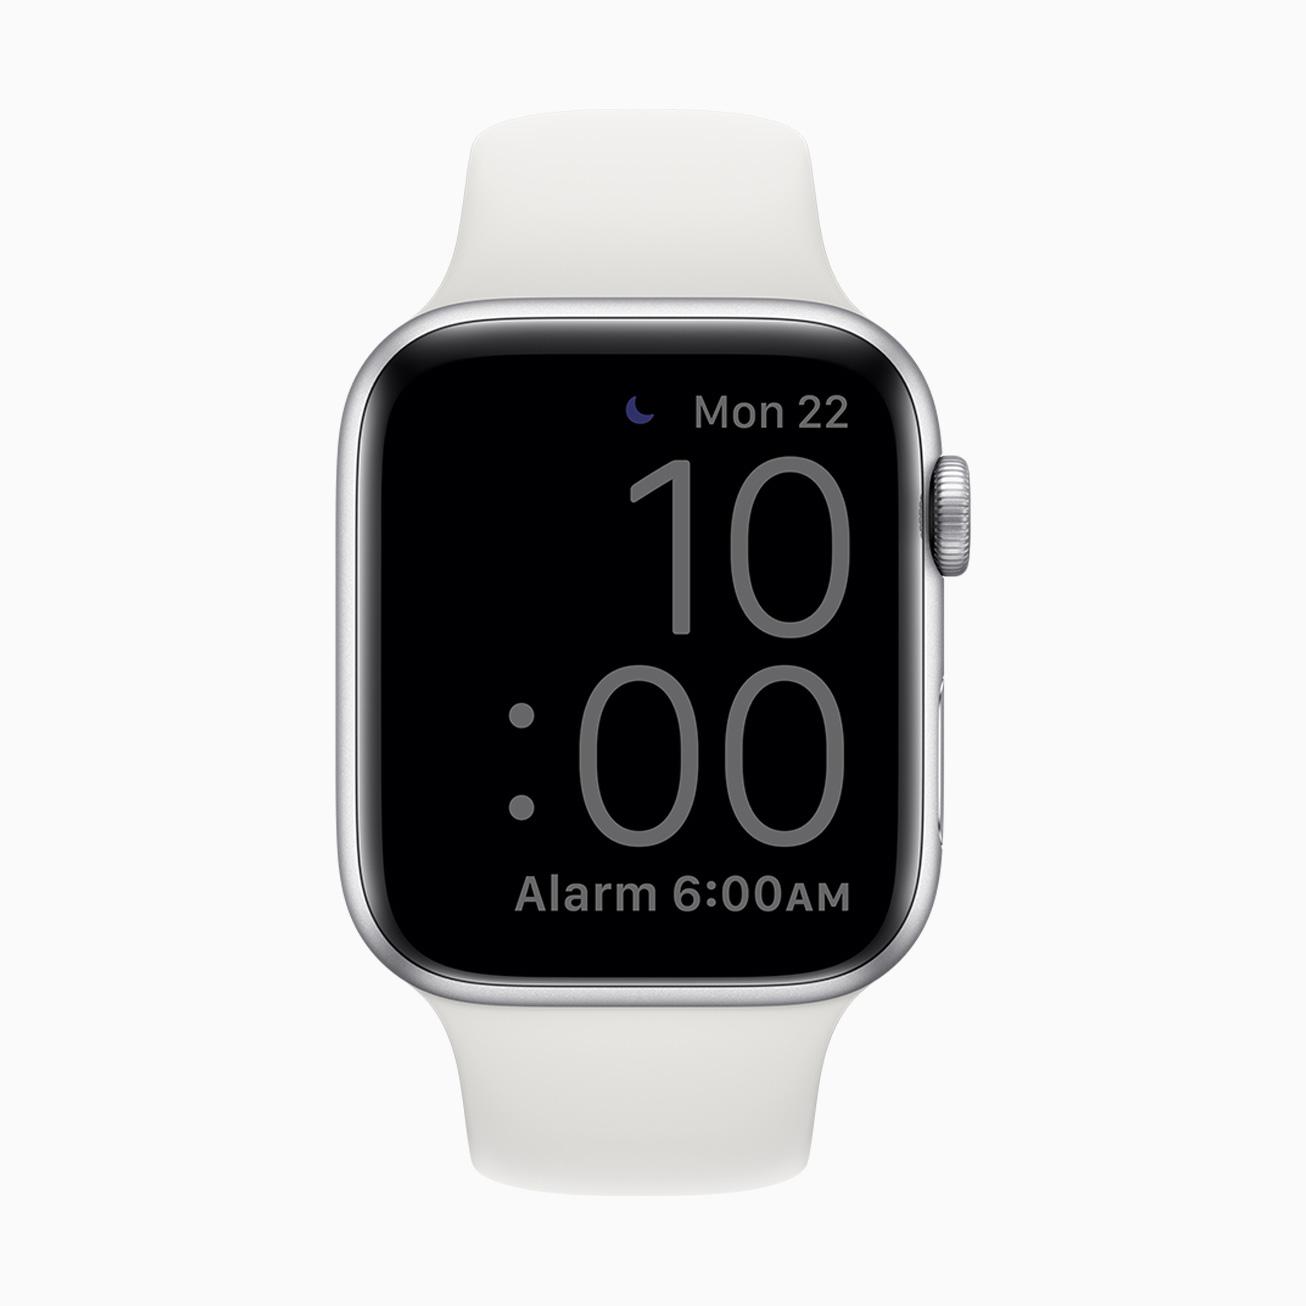 Watch OS 7 sleep mode